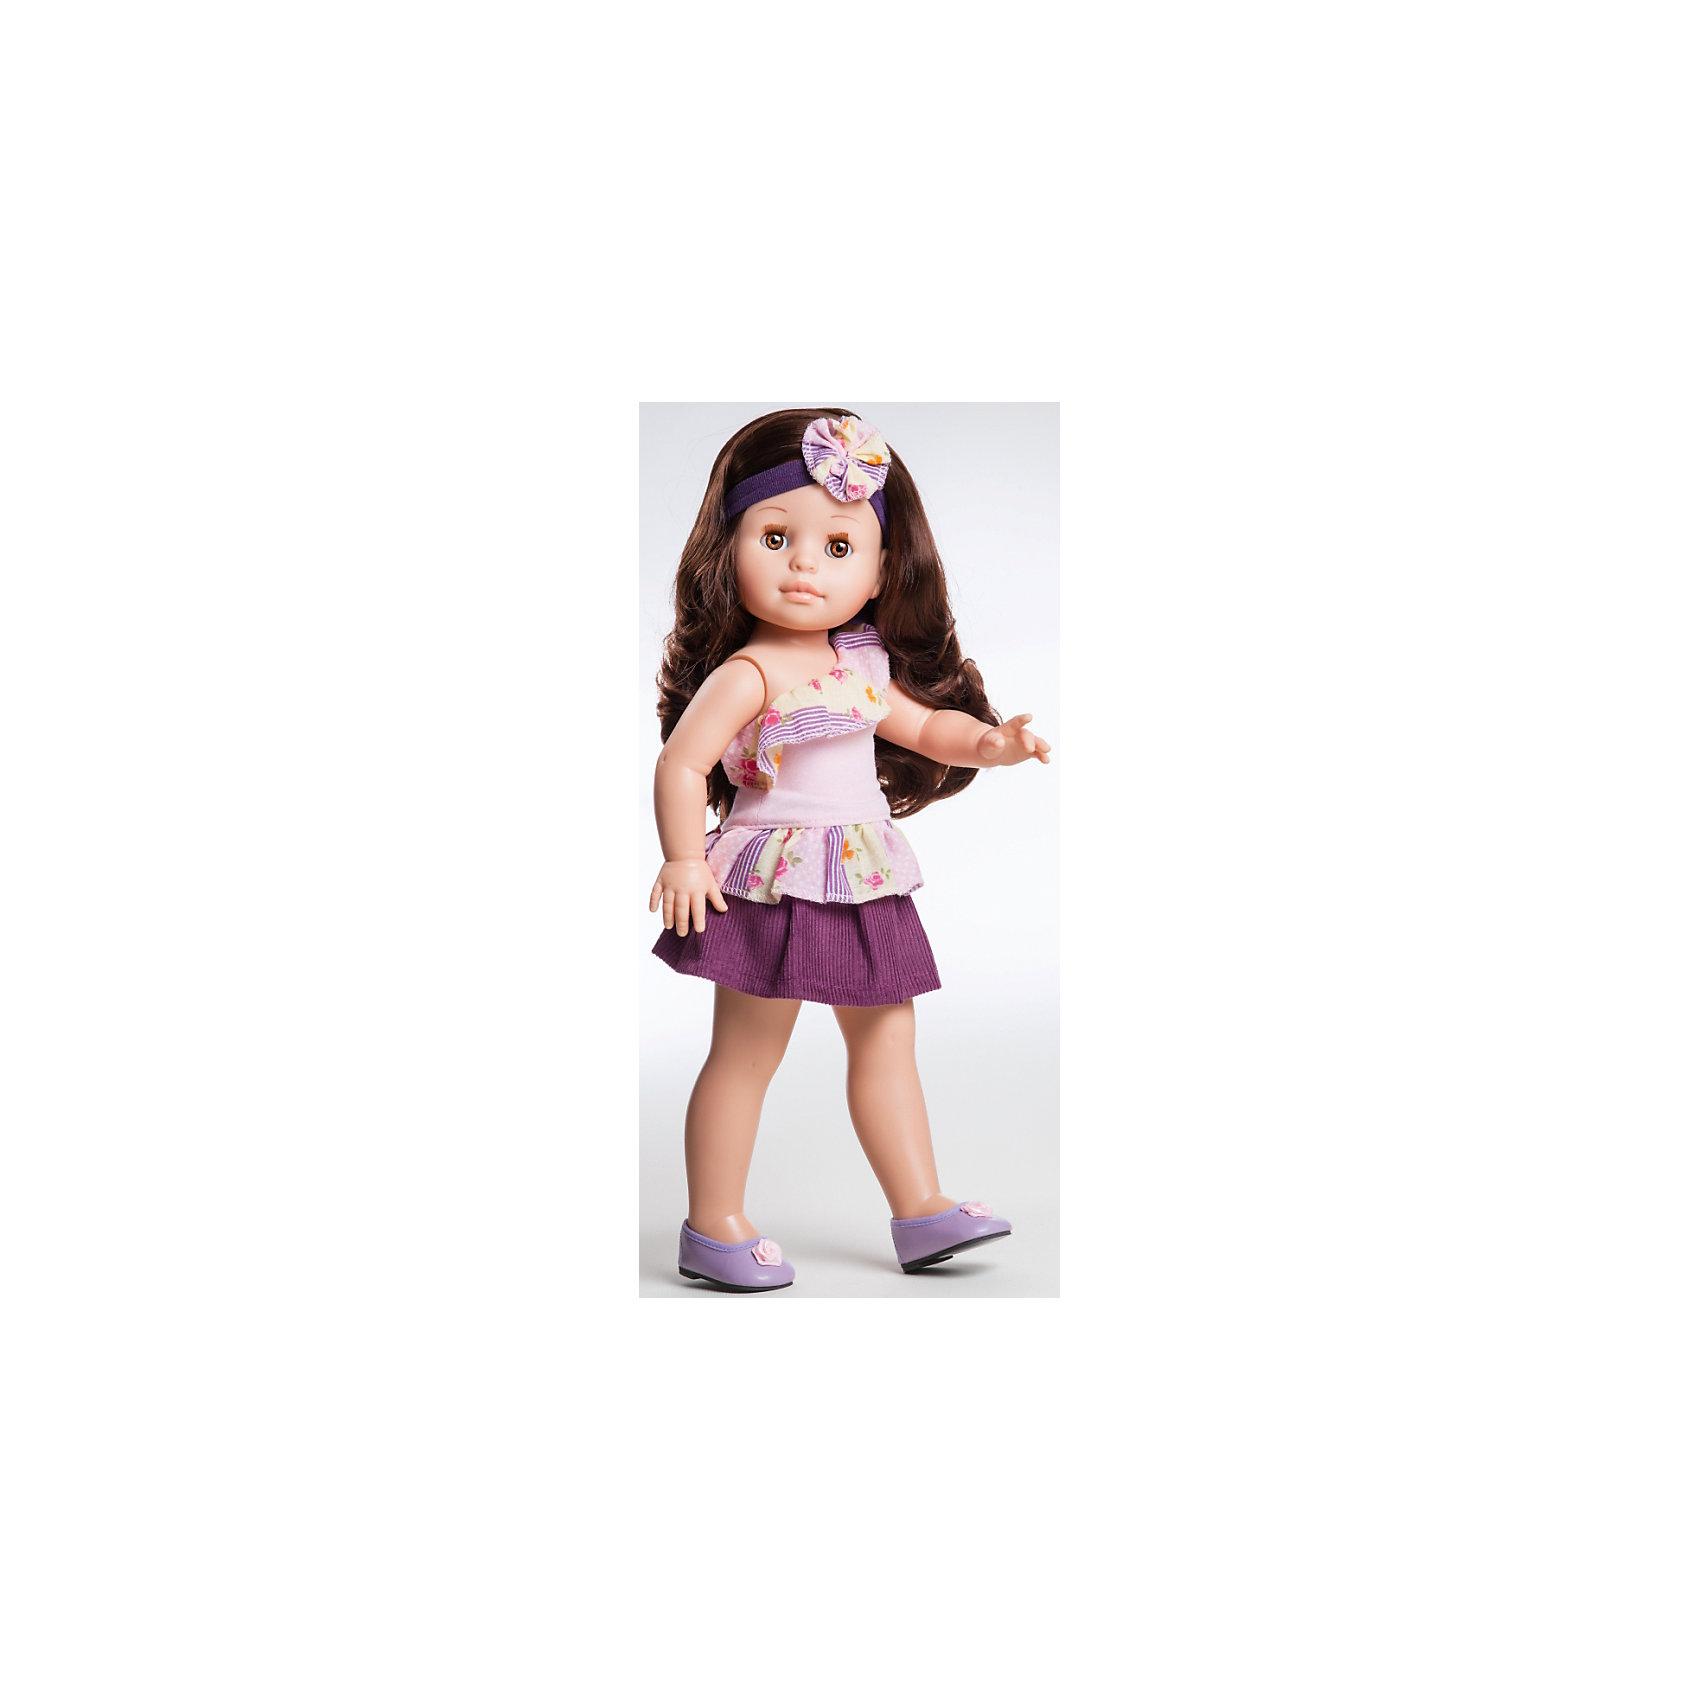 Paola Reina Кукла Эмили, 42 см, Paola Reina paola reina кукла амор 42 см paola reina